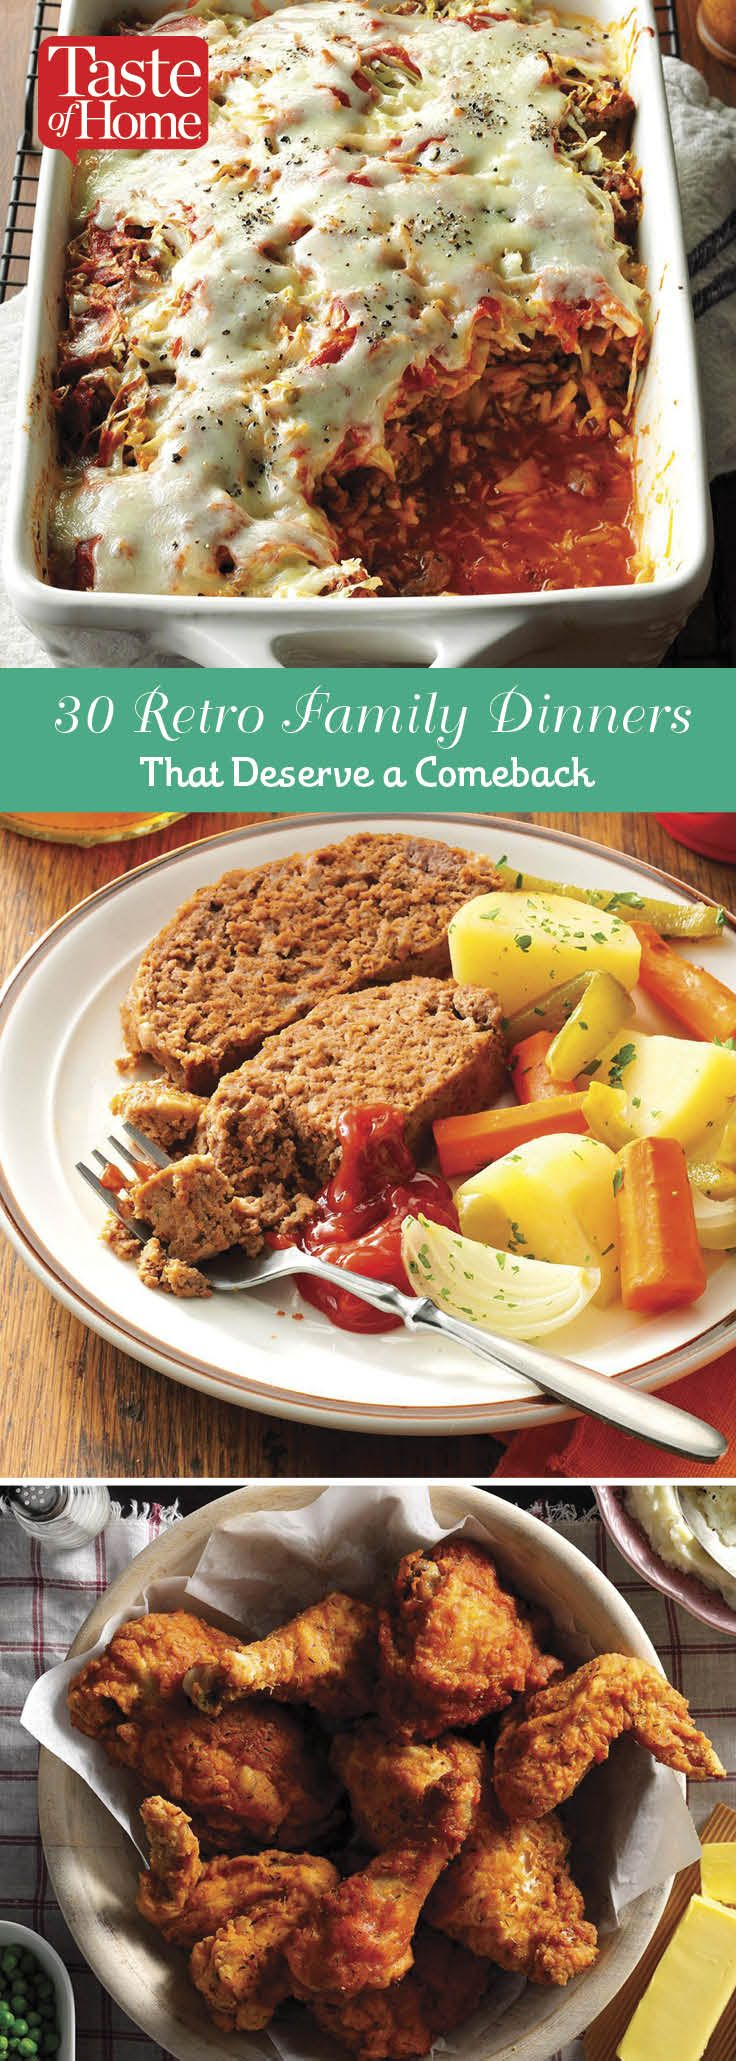 30 Retro Family Dinners That Deserve a Comeback